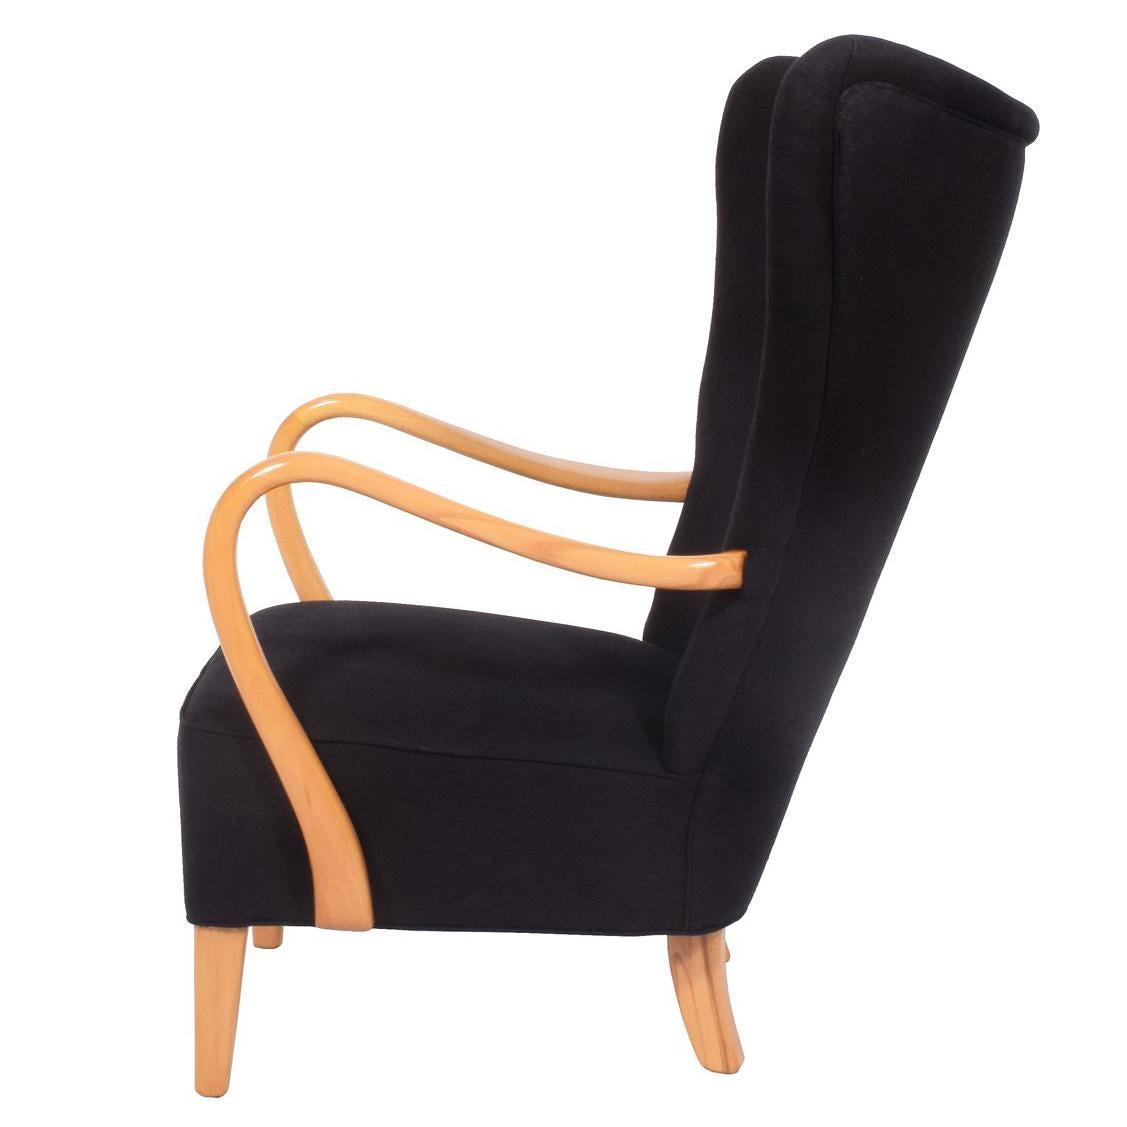 1940s Easy Chair by Elias Svedberg